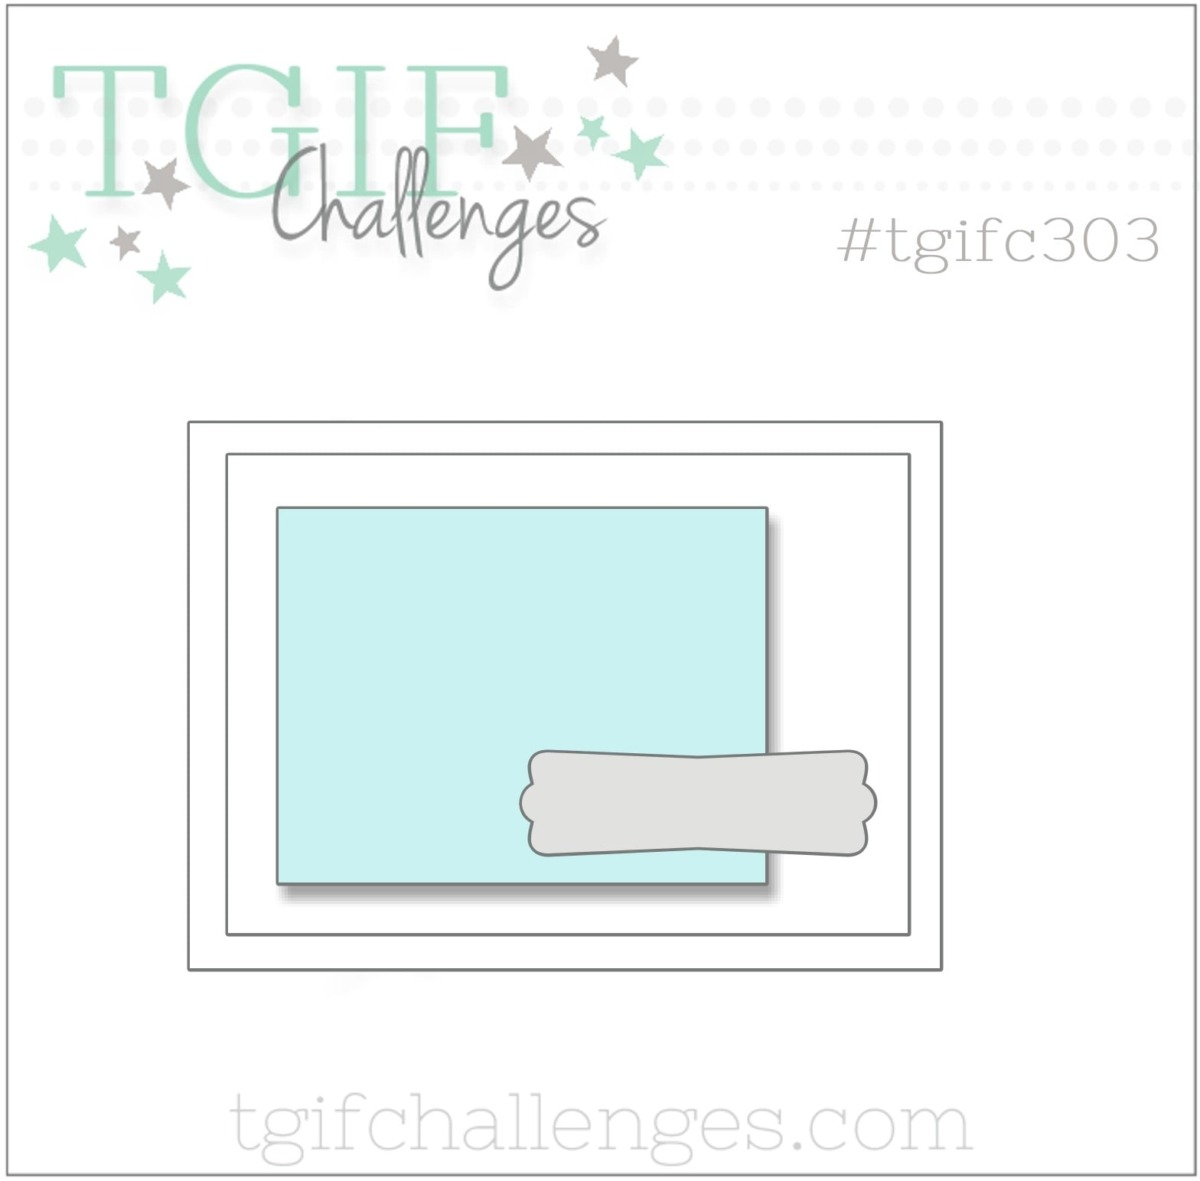 tgifc303 Sketch Challenge